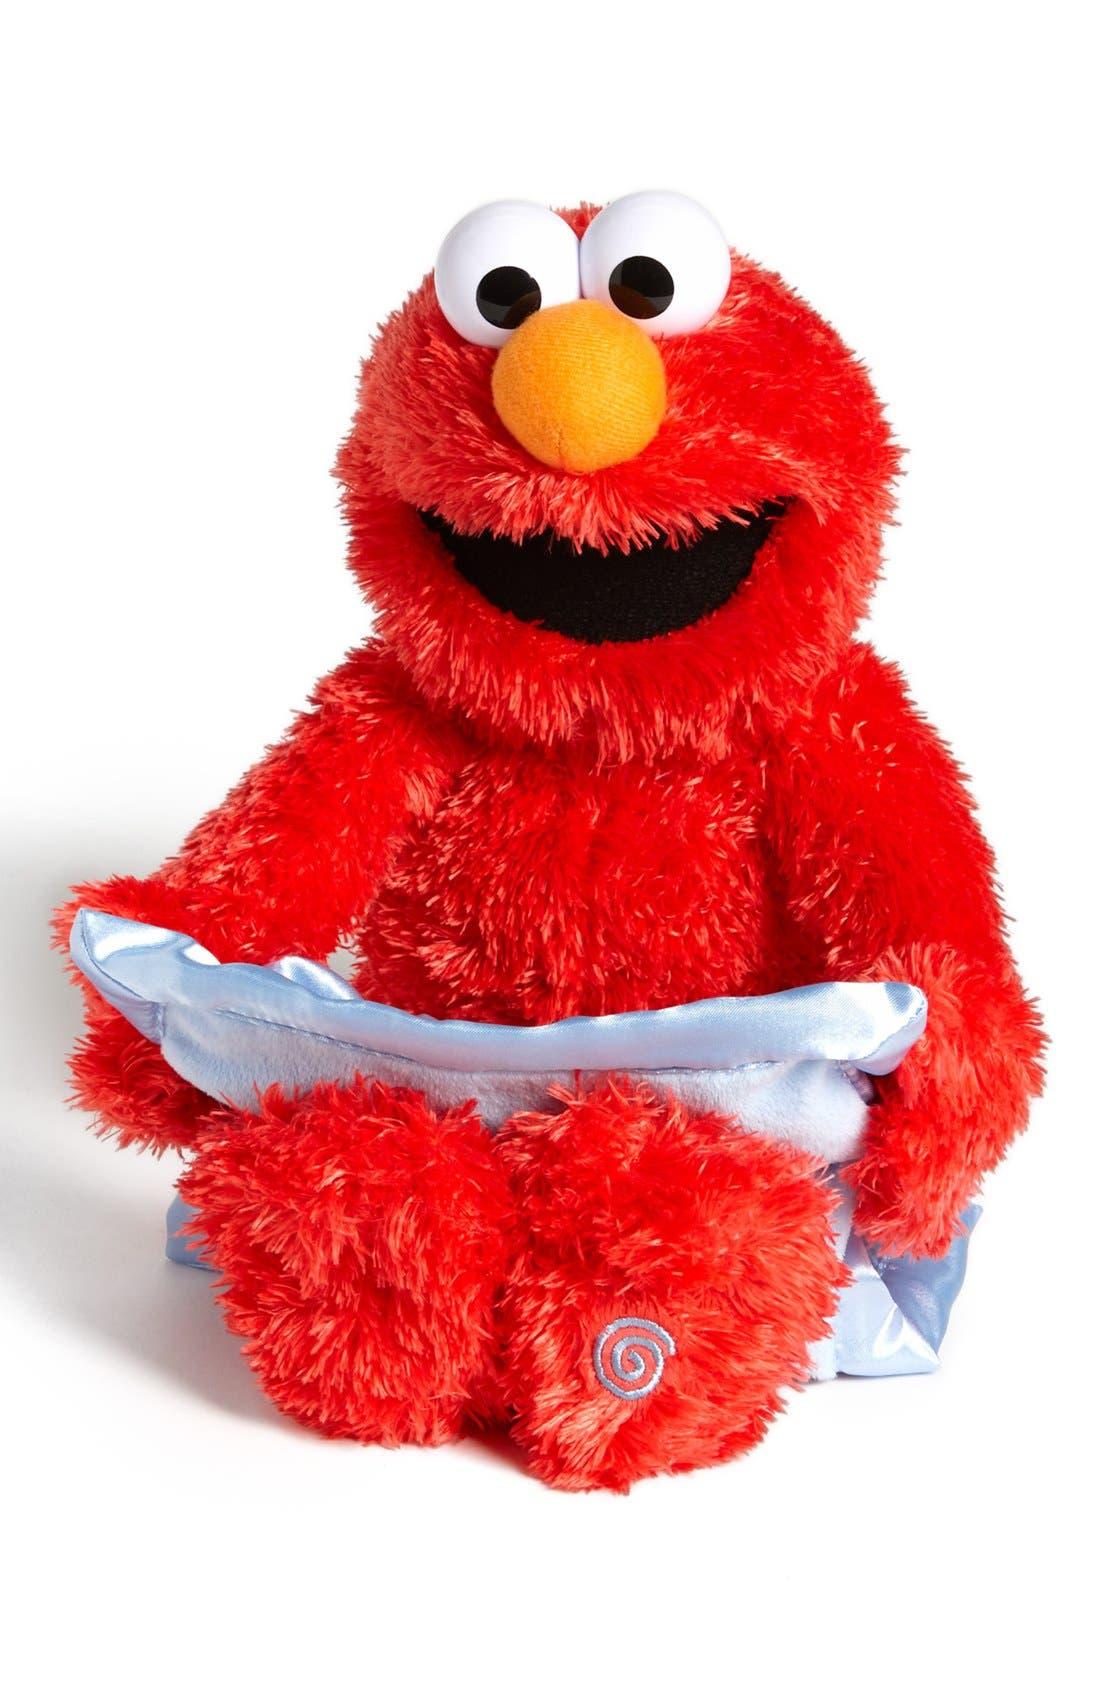 'Sesame Street<sup>®</sup> Peek-A-Boo Elmo<sup>™</sup>' Talking Plush Toy,                             Main thumbnail 1, color,                             600